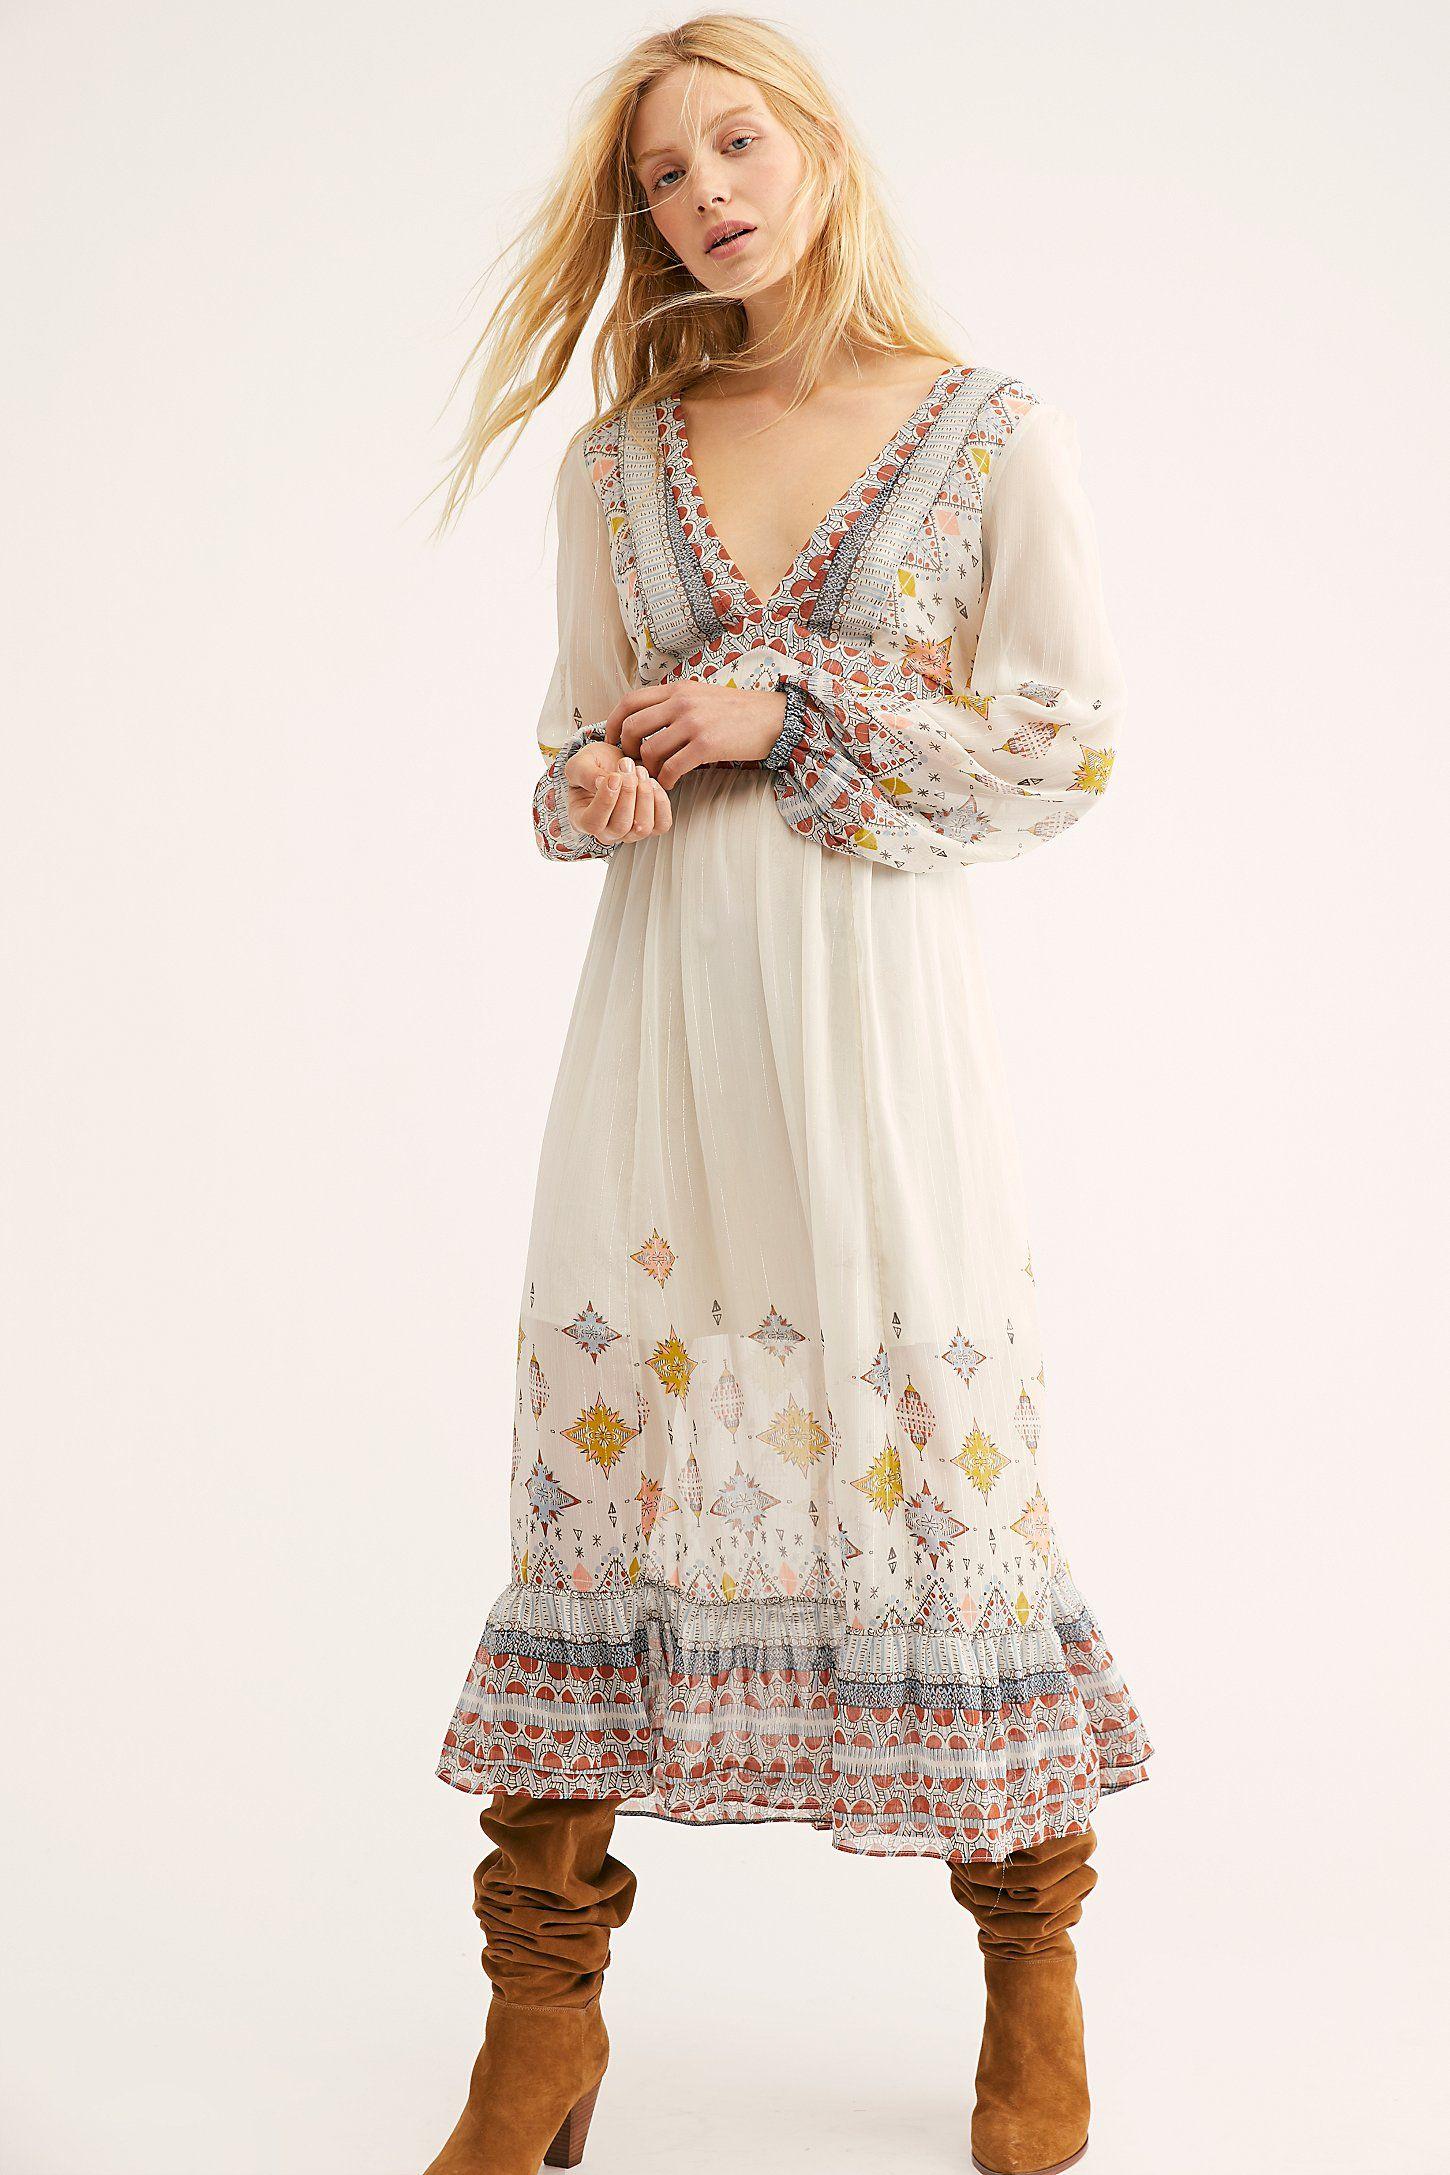 46584281dd509 Wishing Well Midi Dress in 2019 | Garb | Boho dress, Maxi skirt ...